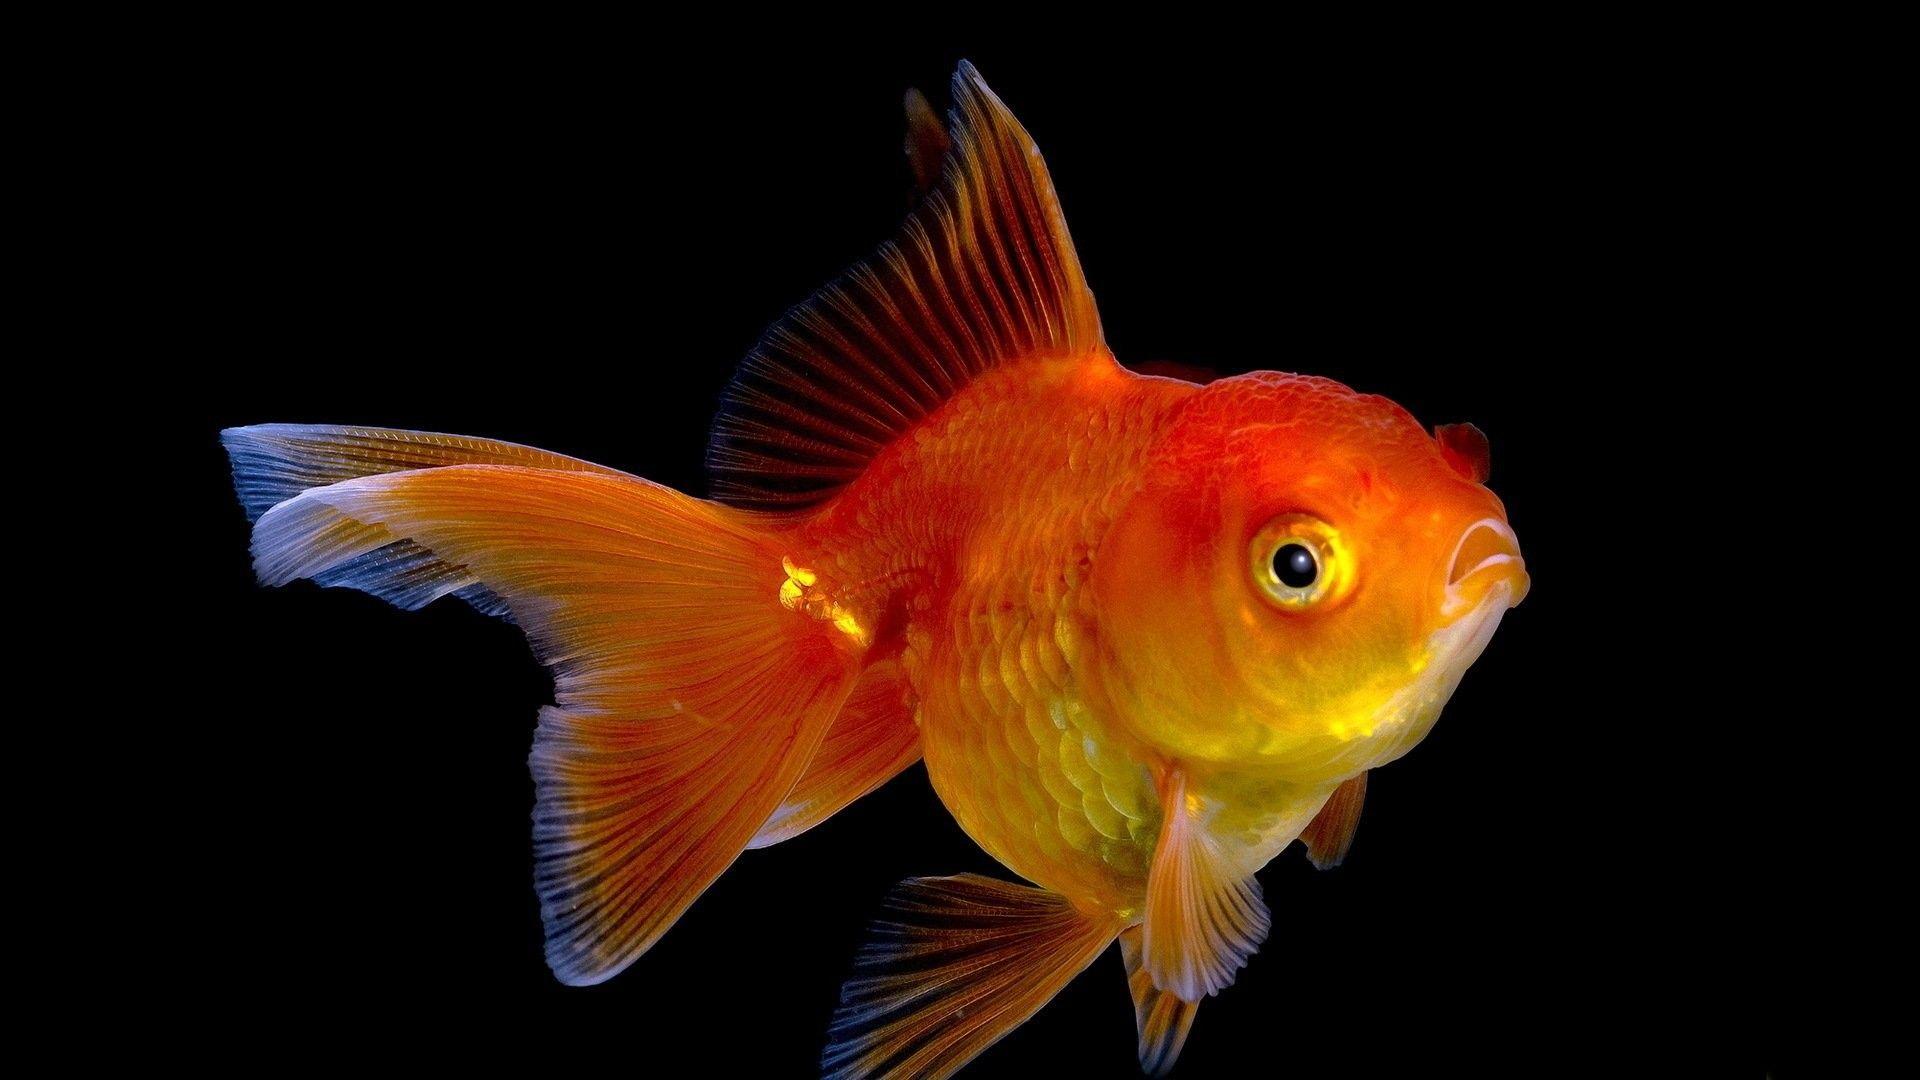 Elegant Goldfish Hd Wallpapers 1080p En 2020 Animales